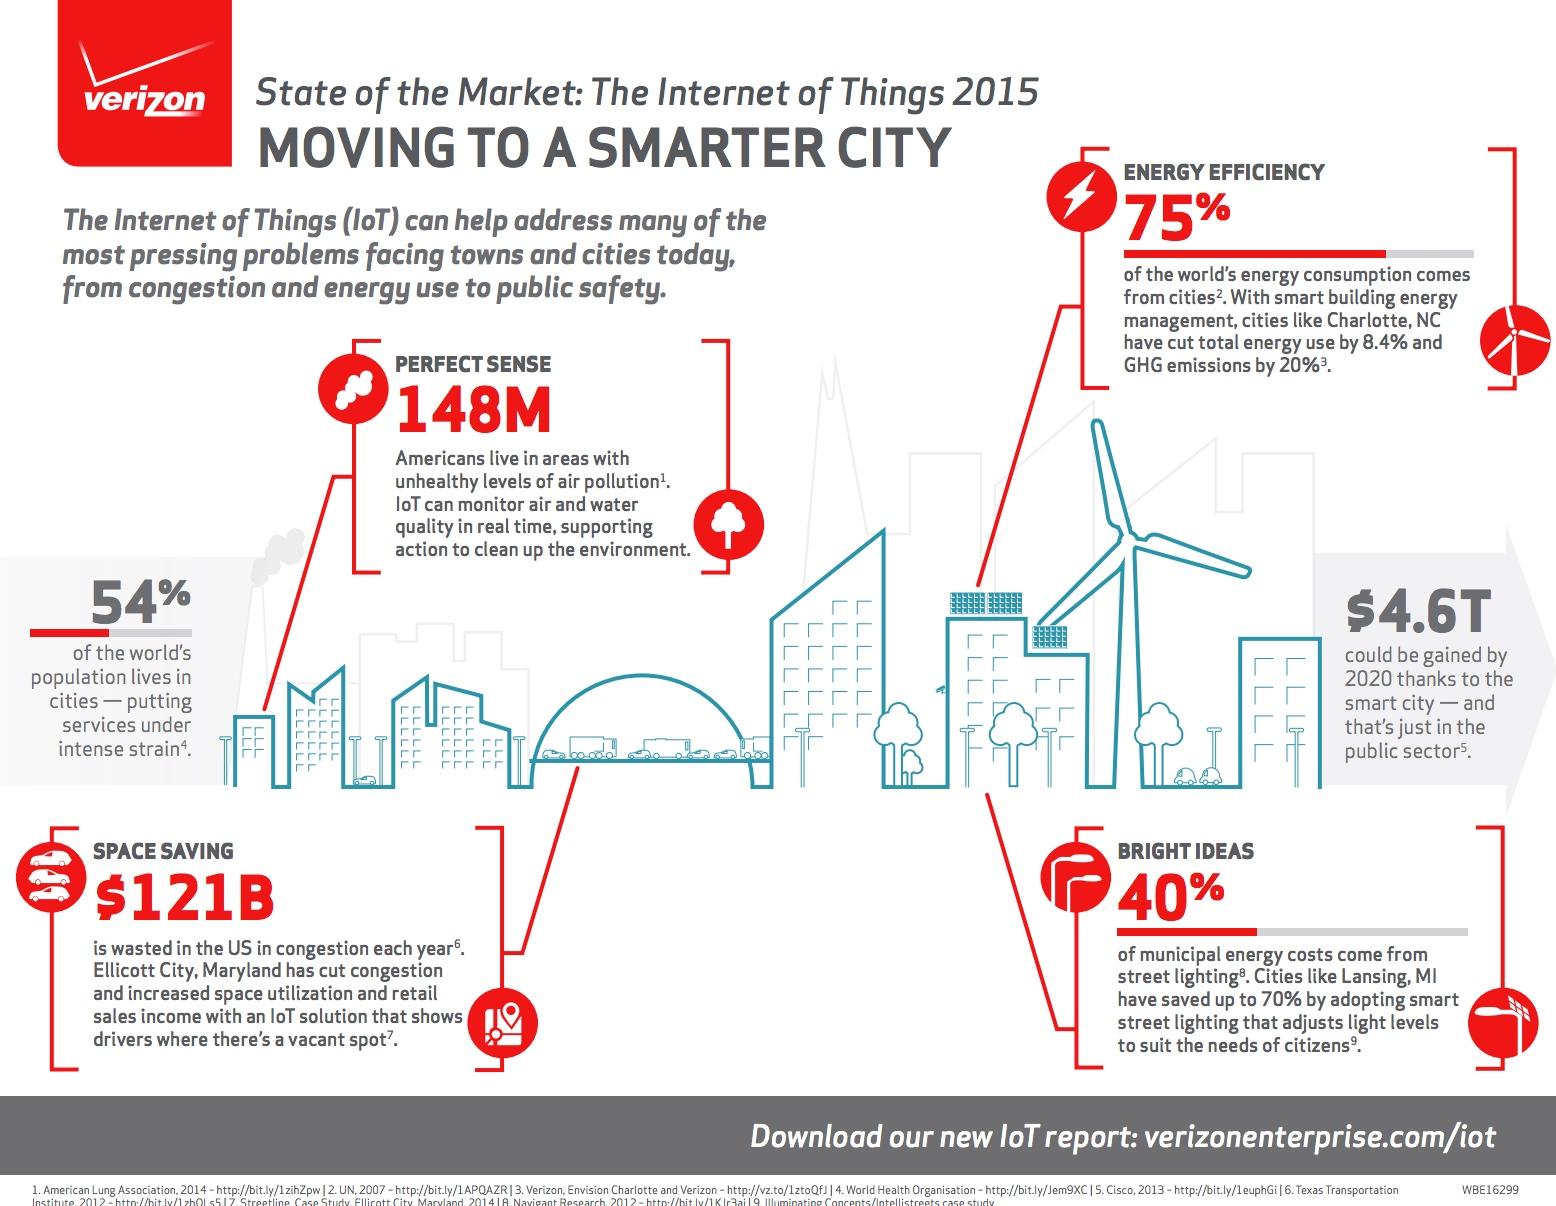 www_verizonenterprise_com_resources_infographic_ig_moving-to-a-smart-city_en_xg_pdf